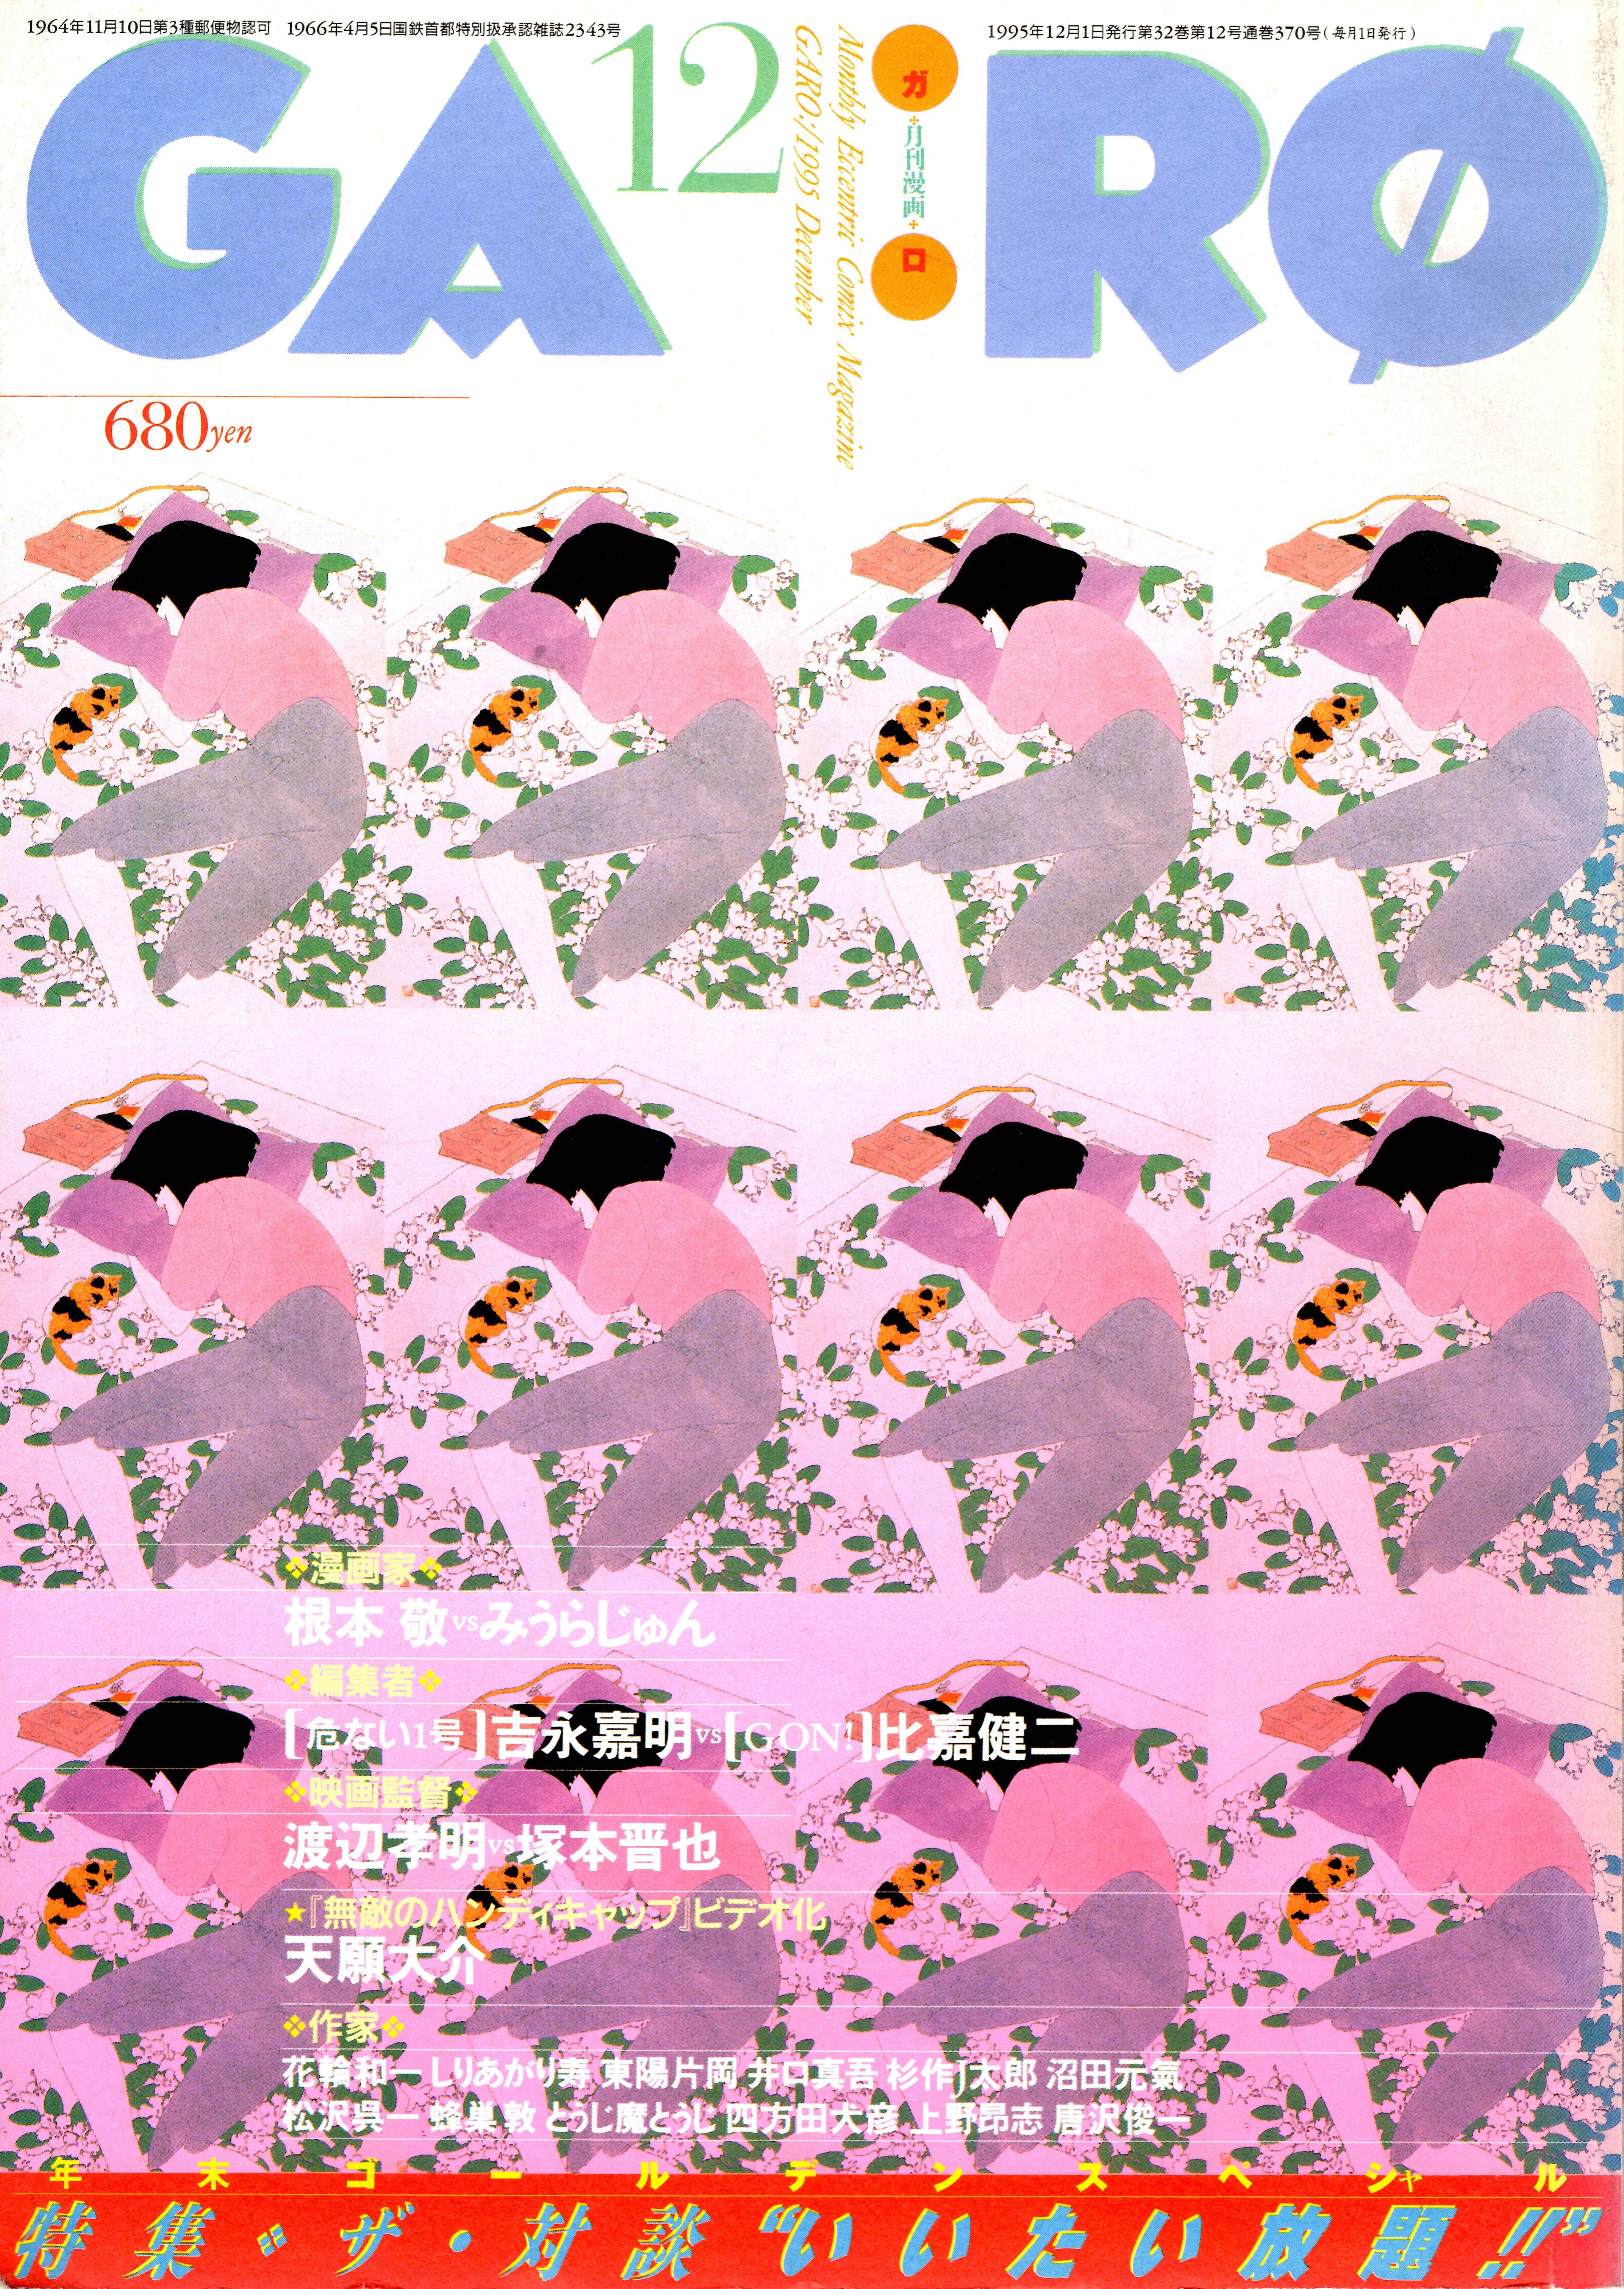 f:id:kougasetumei:20191224175241j:image:w500